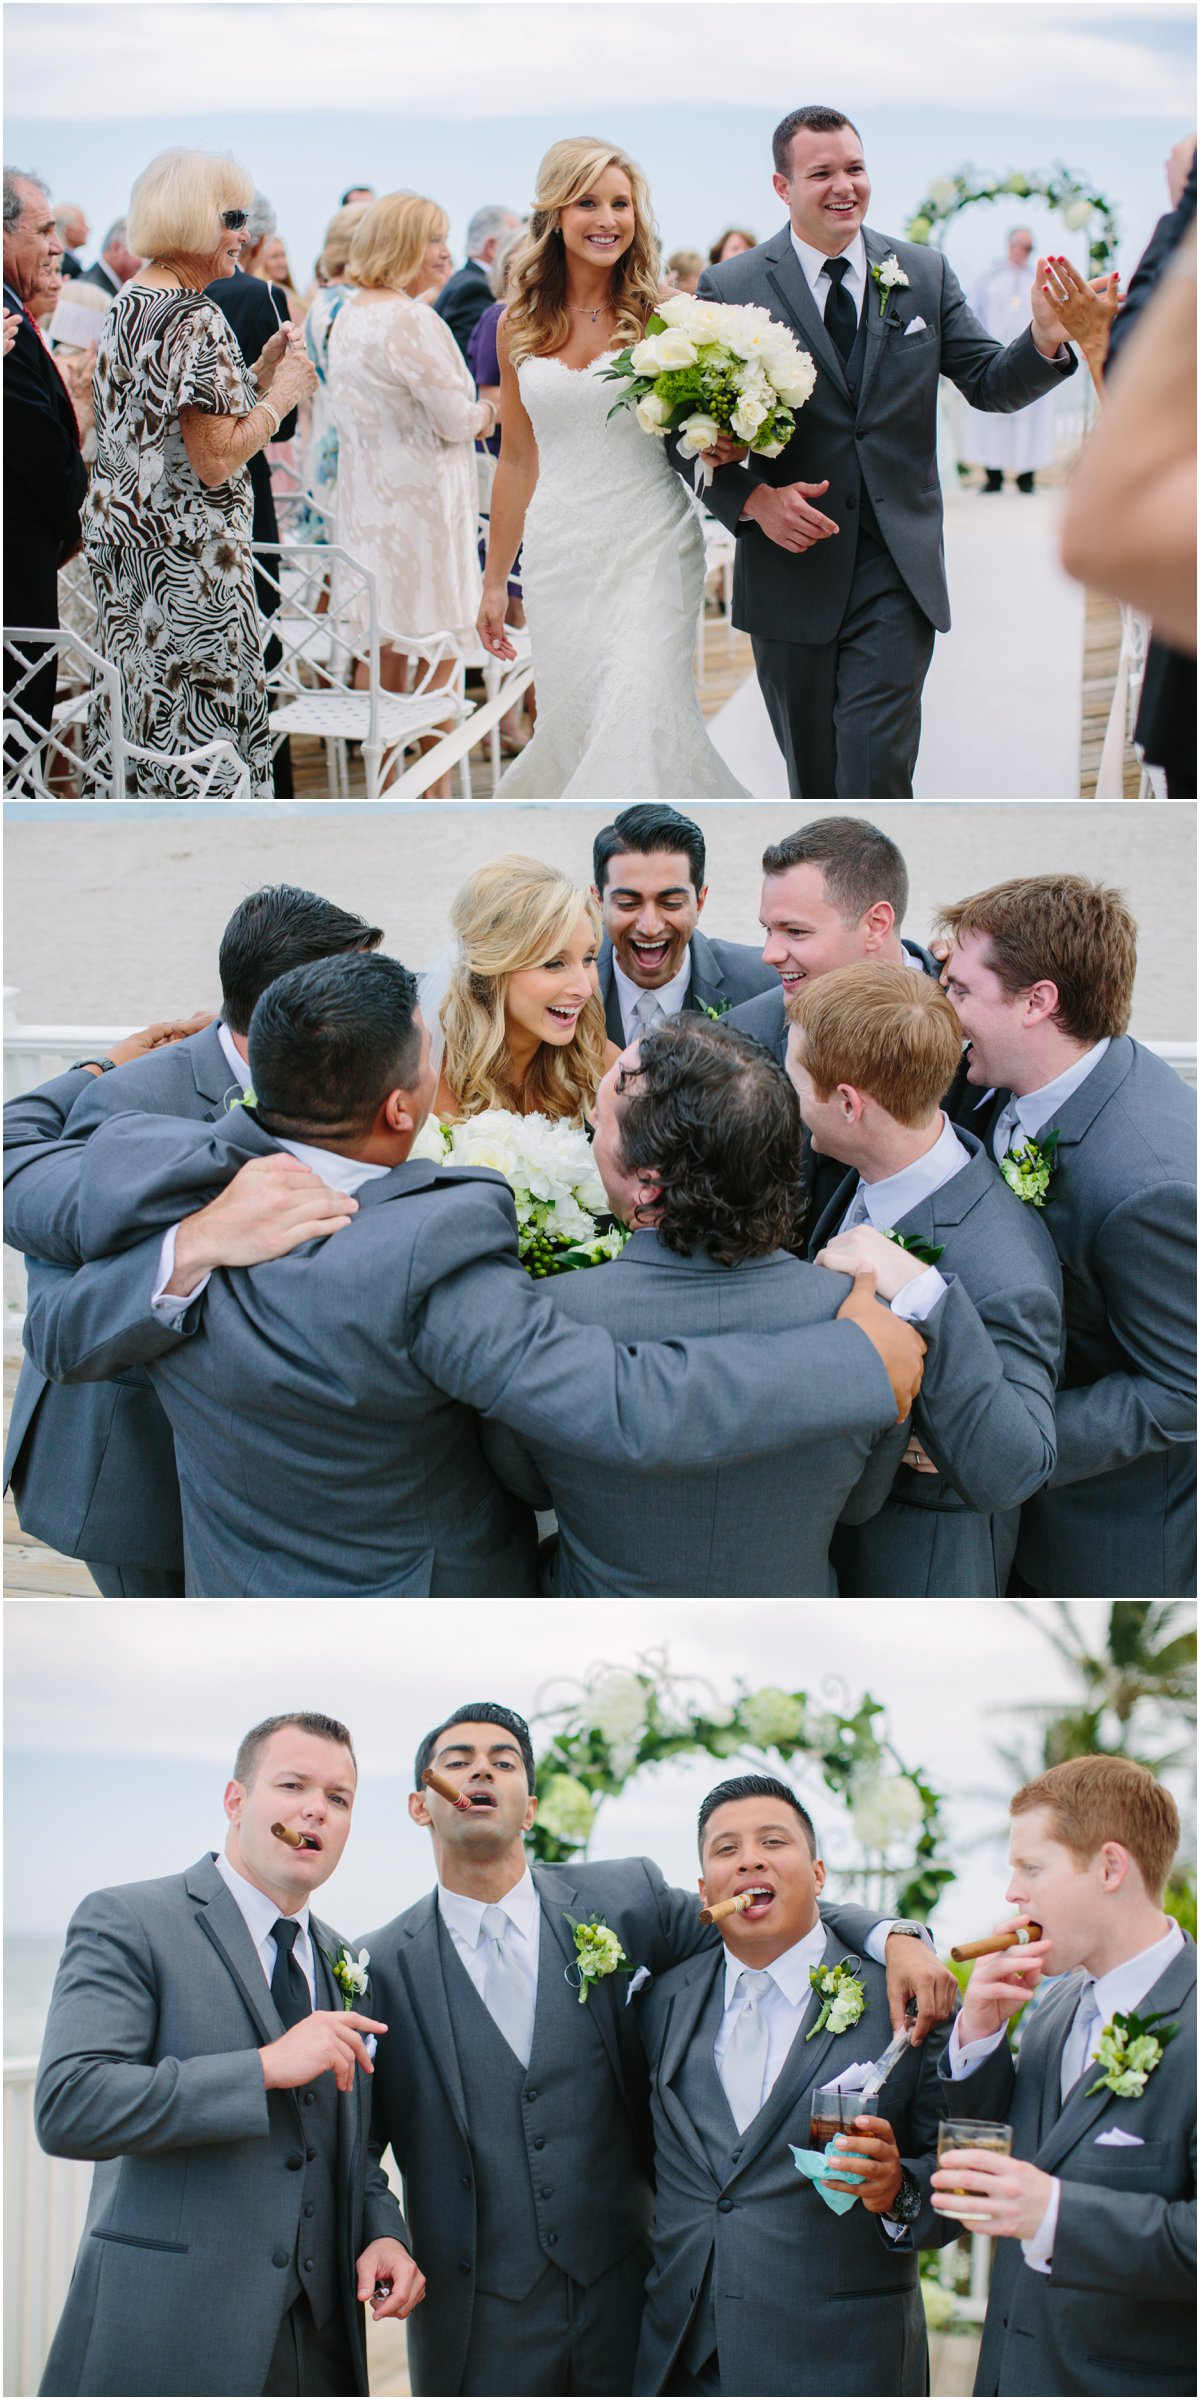 South-Florida-Wedding-Photographer-Hillsboro-lighthouse_0019